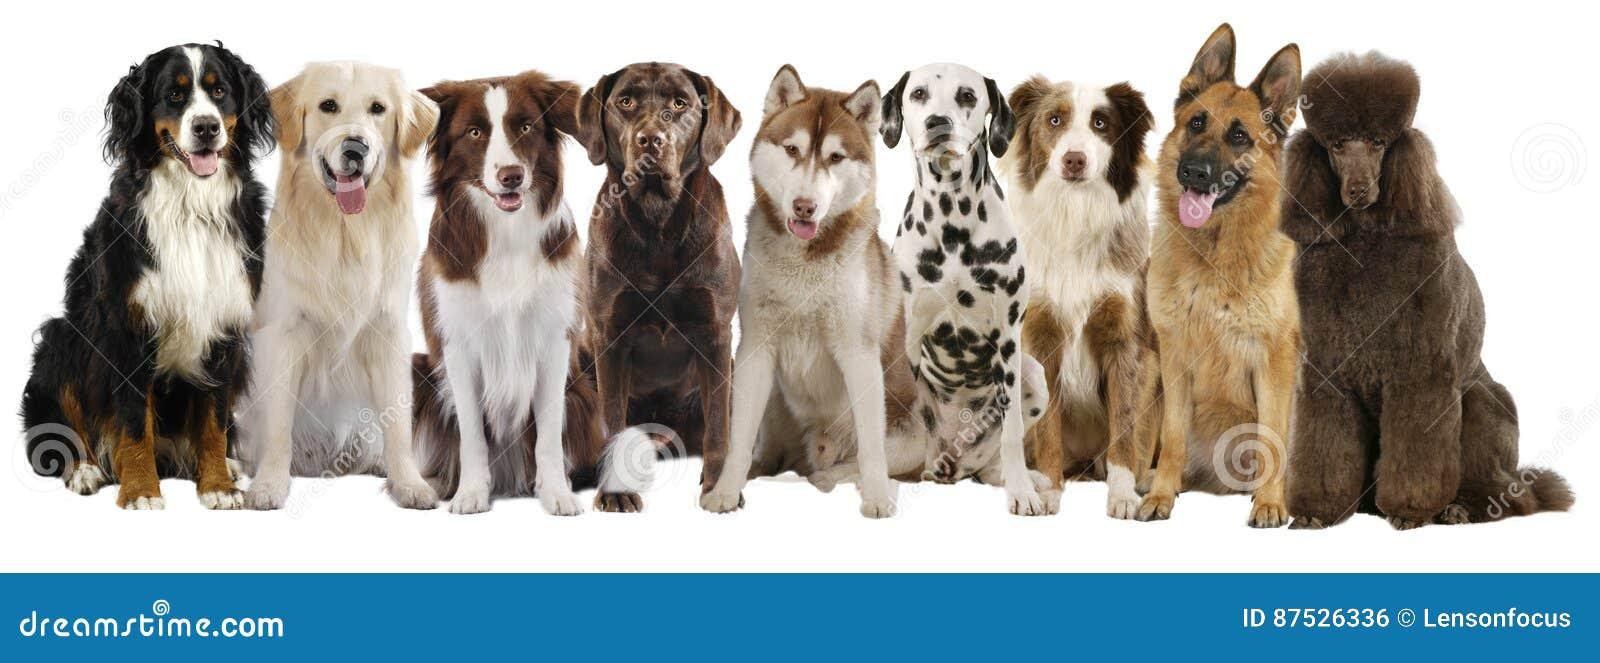 Dog Breeds Different Species